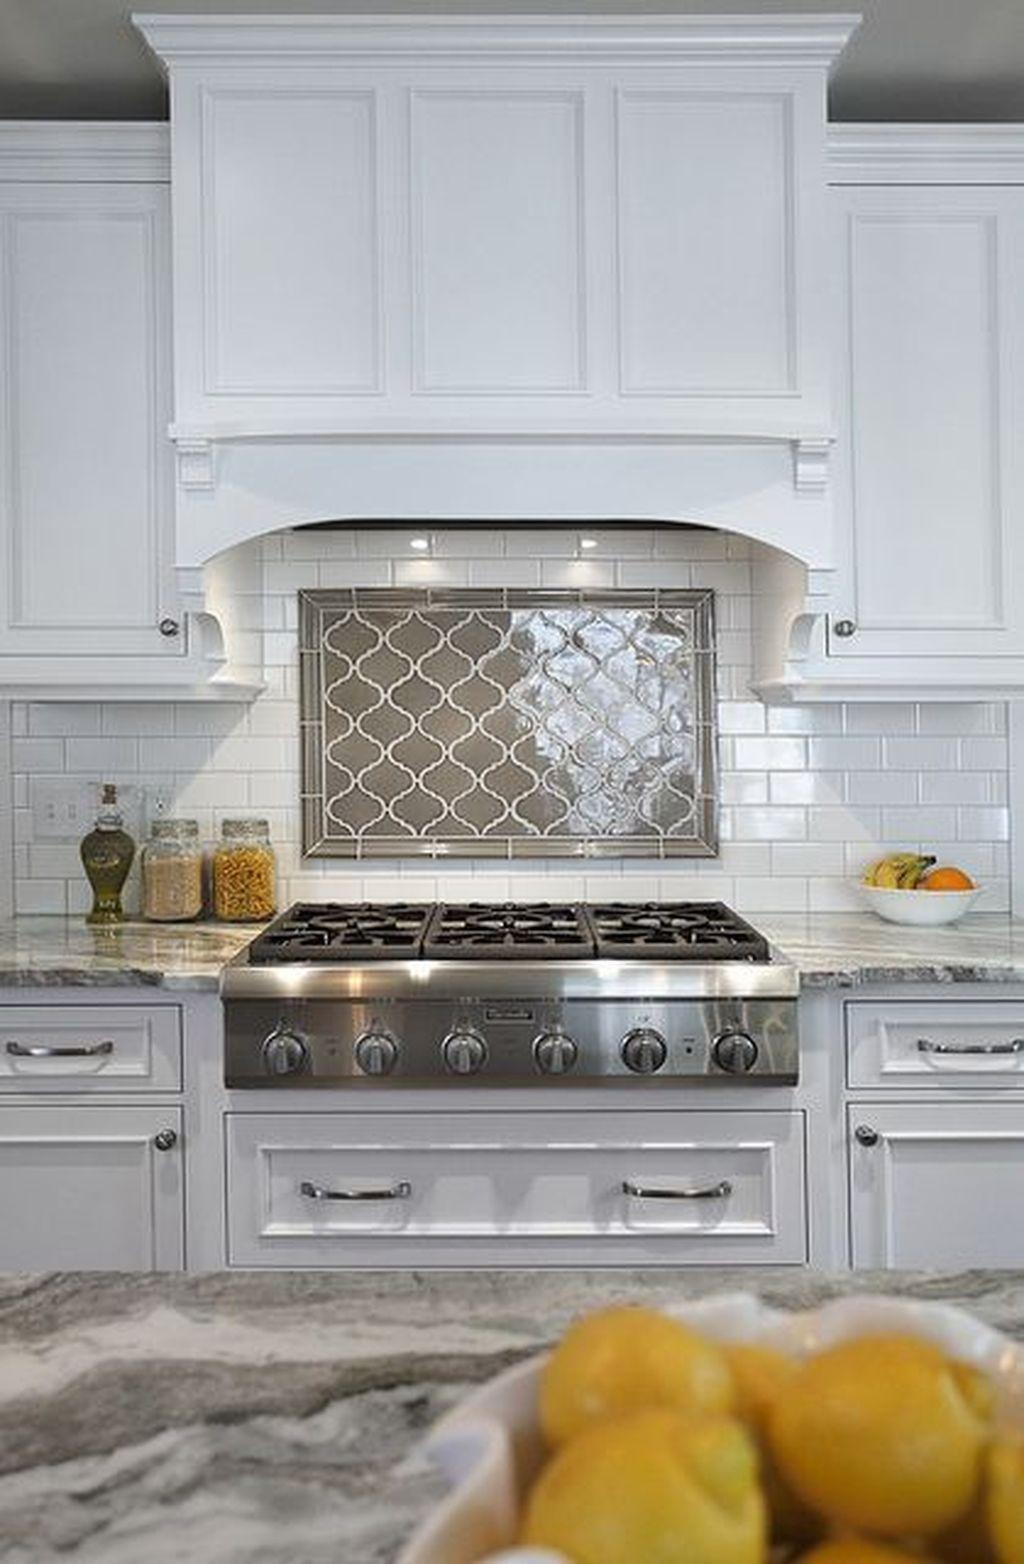 5+ Amazing Kitchen Tile Backsplash Ideas - TRENDHMDCR  Kitchen